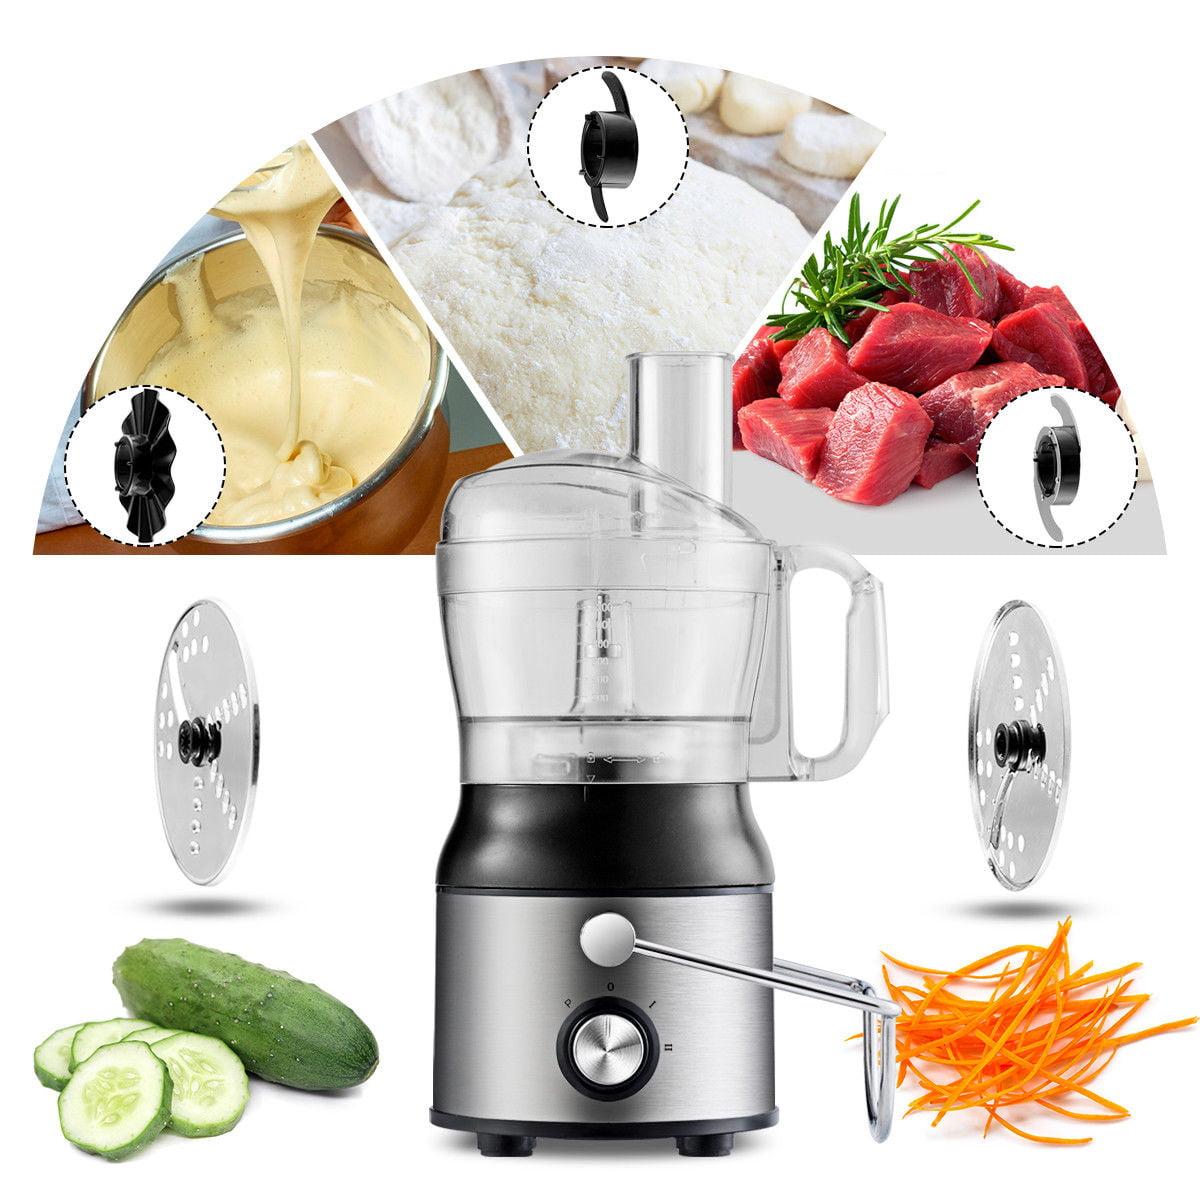 Gymax 5in1 Multifunction Juice Extractor Juicer Blender Grinder Chopper Food Processor - image 5 of 10